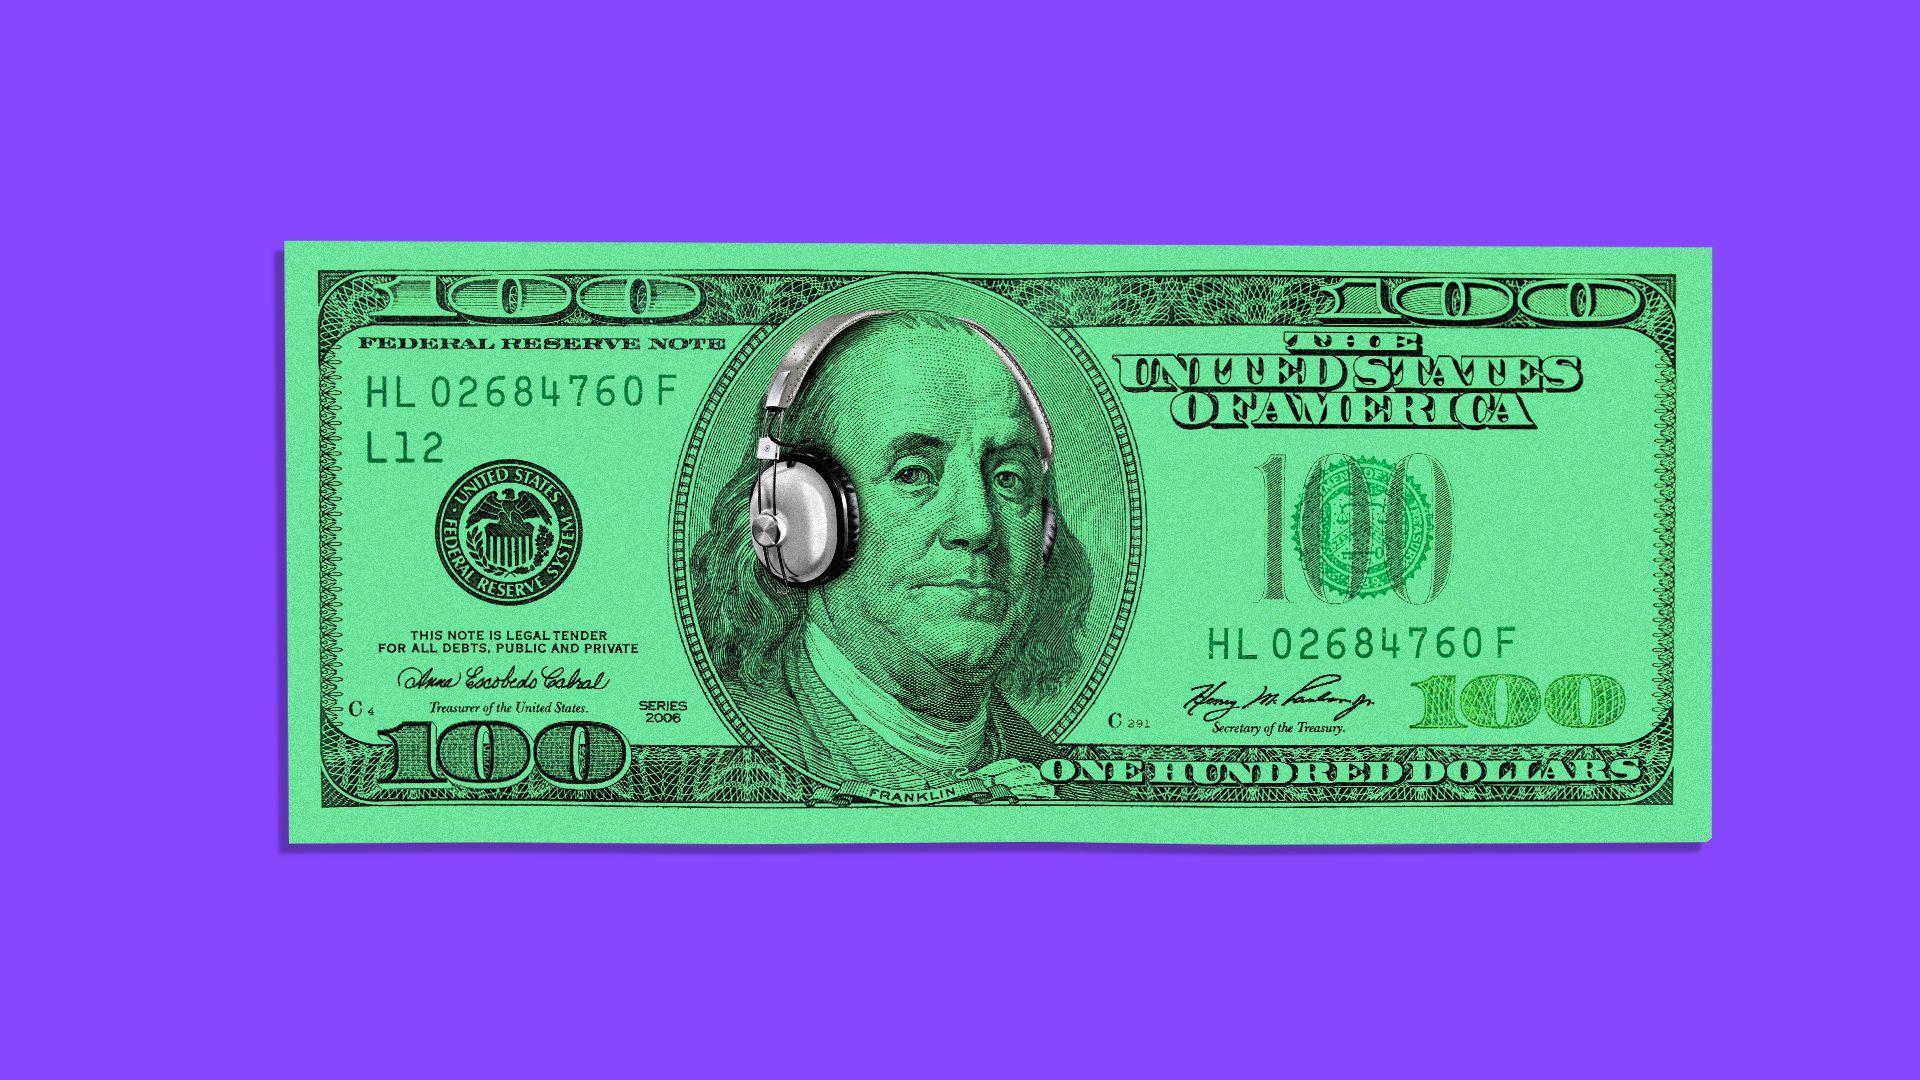 Illustration of a hundred dollar bill with Benjamin Franklin wearing headphones.